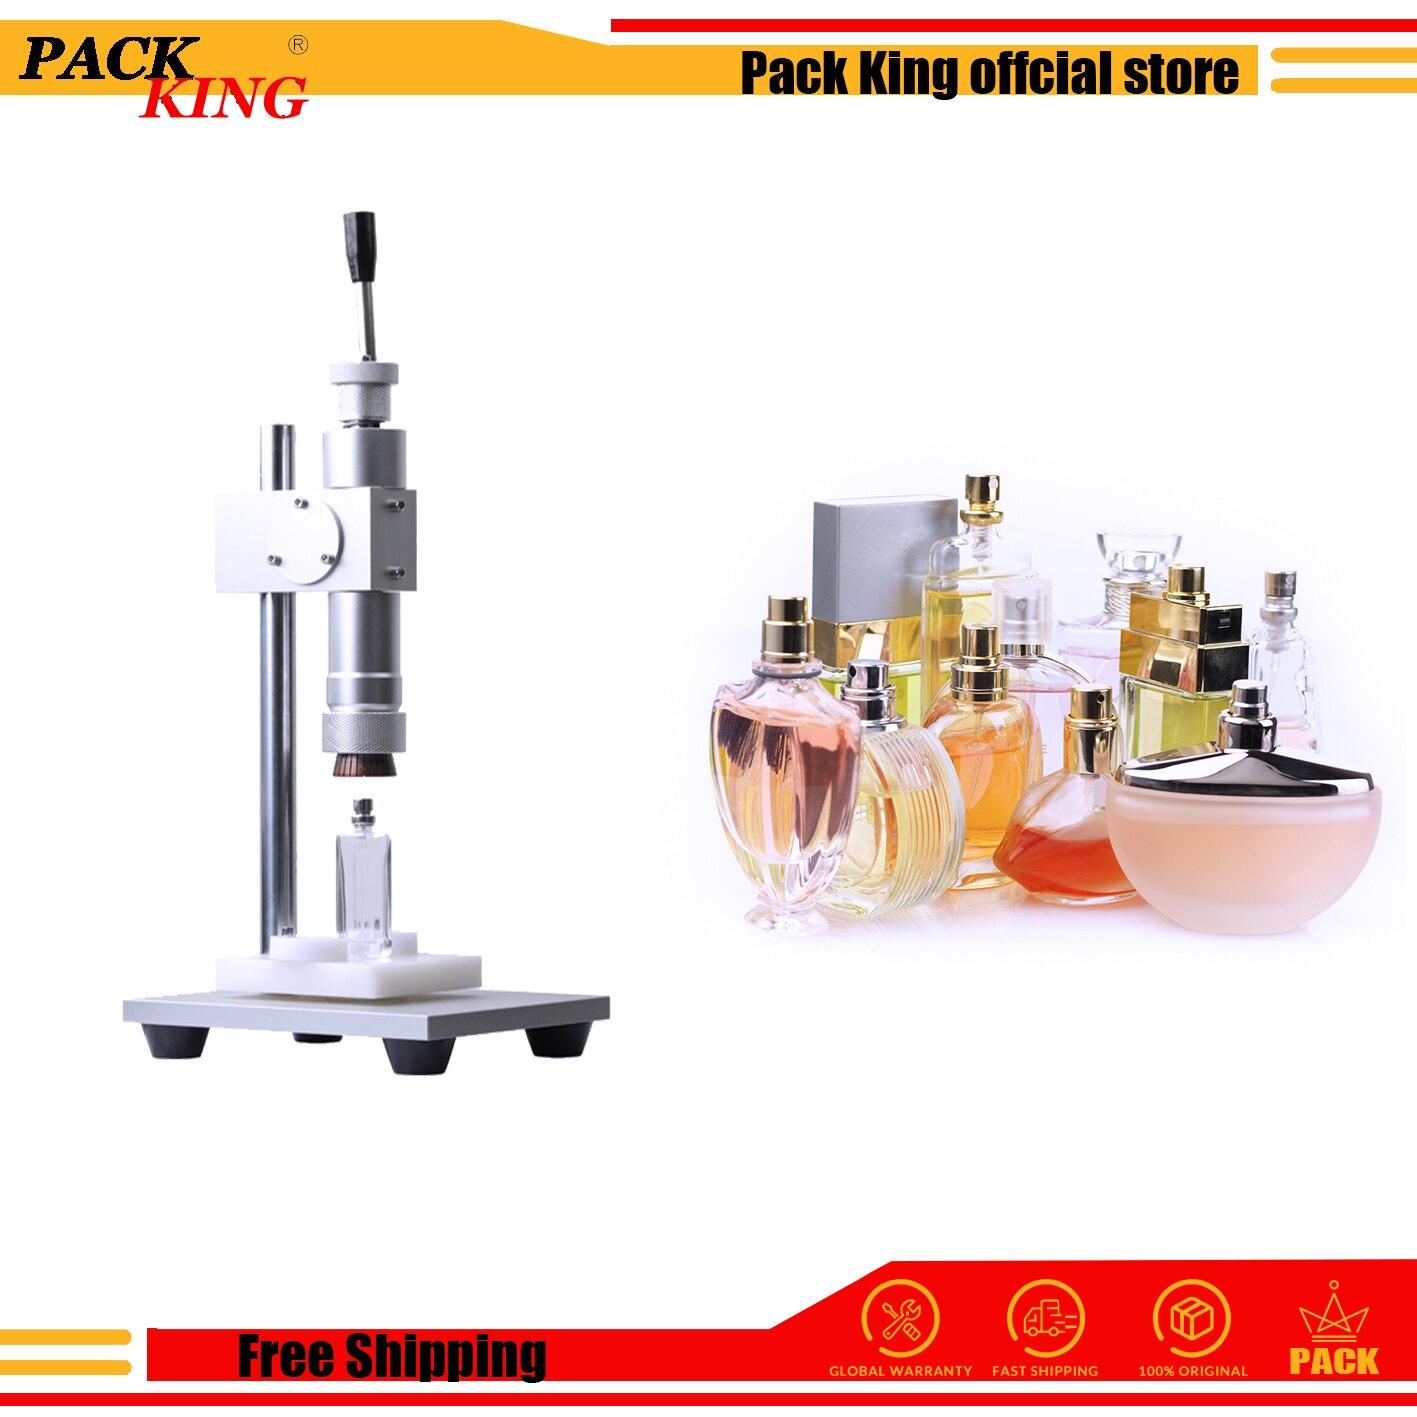 Manual Perfume Capping Machine Crimping Tools Crimper Capper Metal Fragrance Cap Press Fragrance Spray Collar Ring Presser